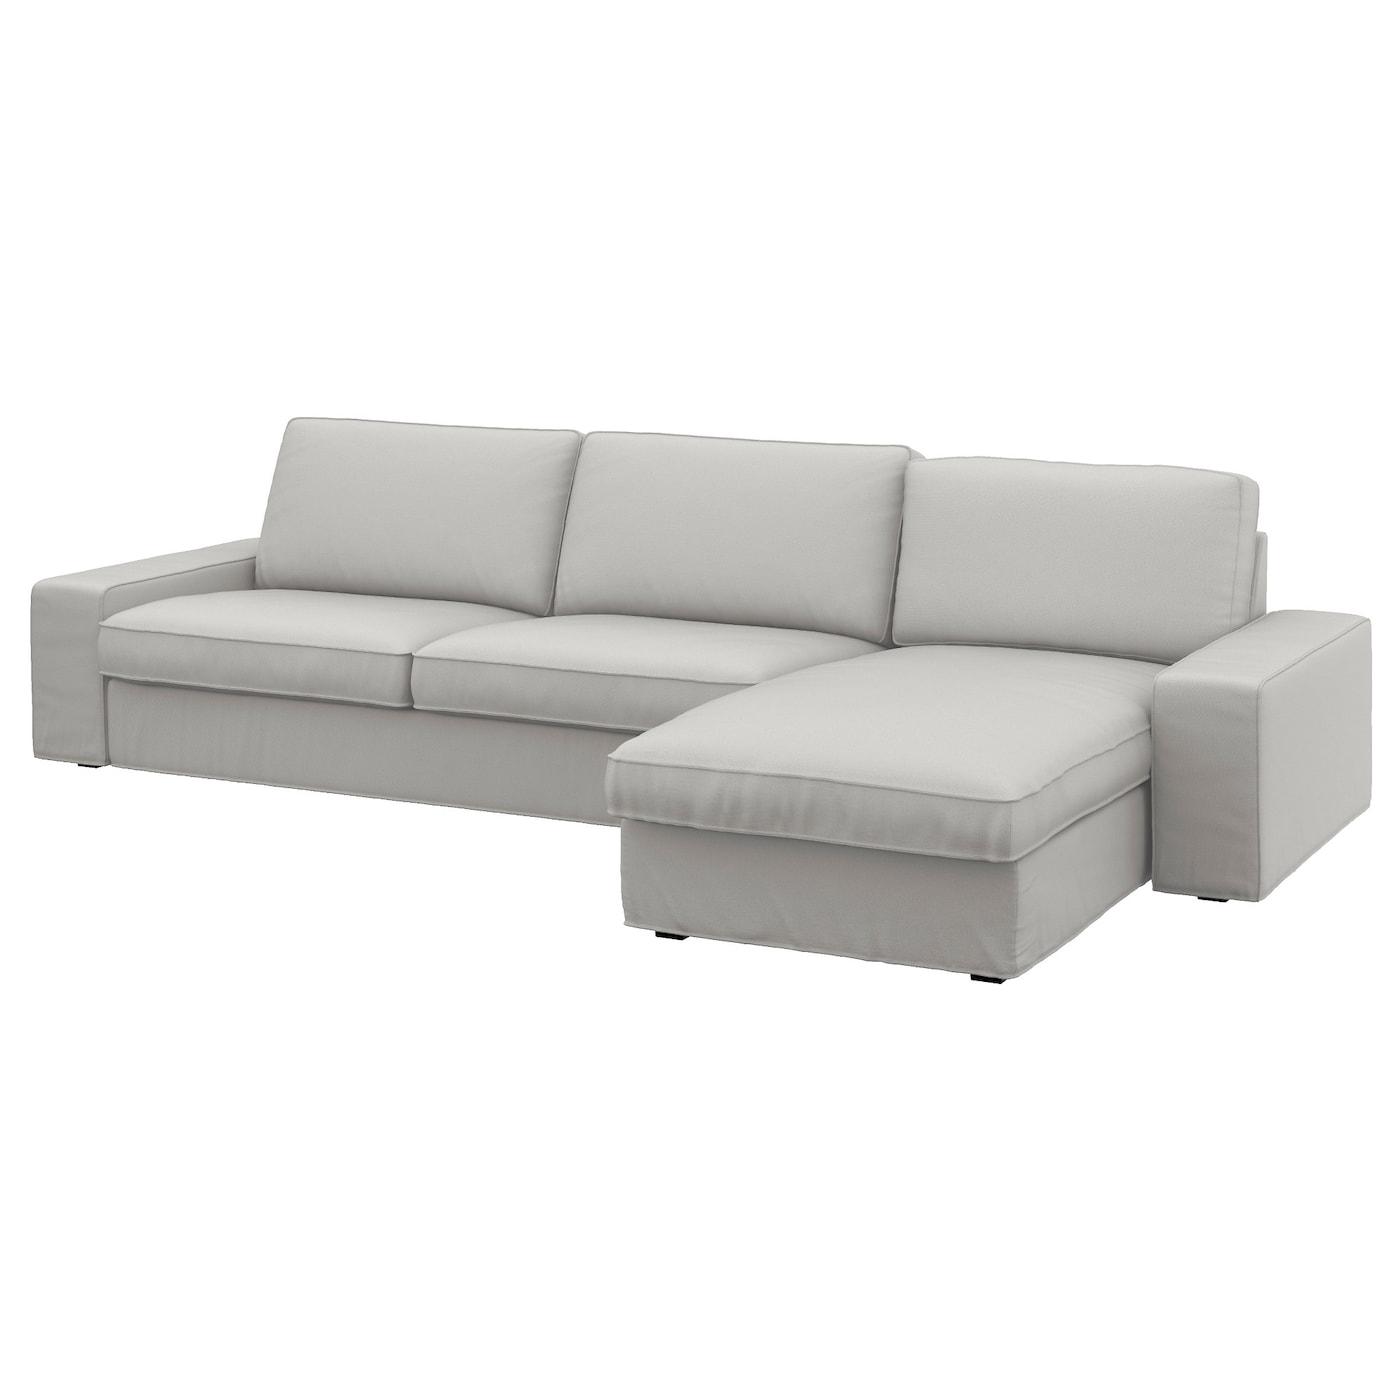 KIVIK 4 seat sofa With chaise longue ramna light grey IKEA